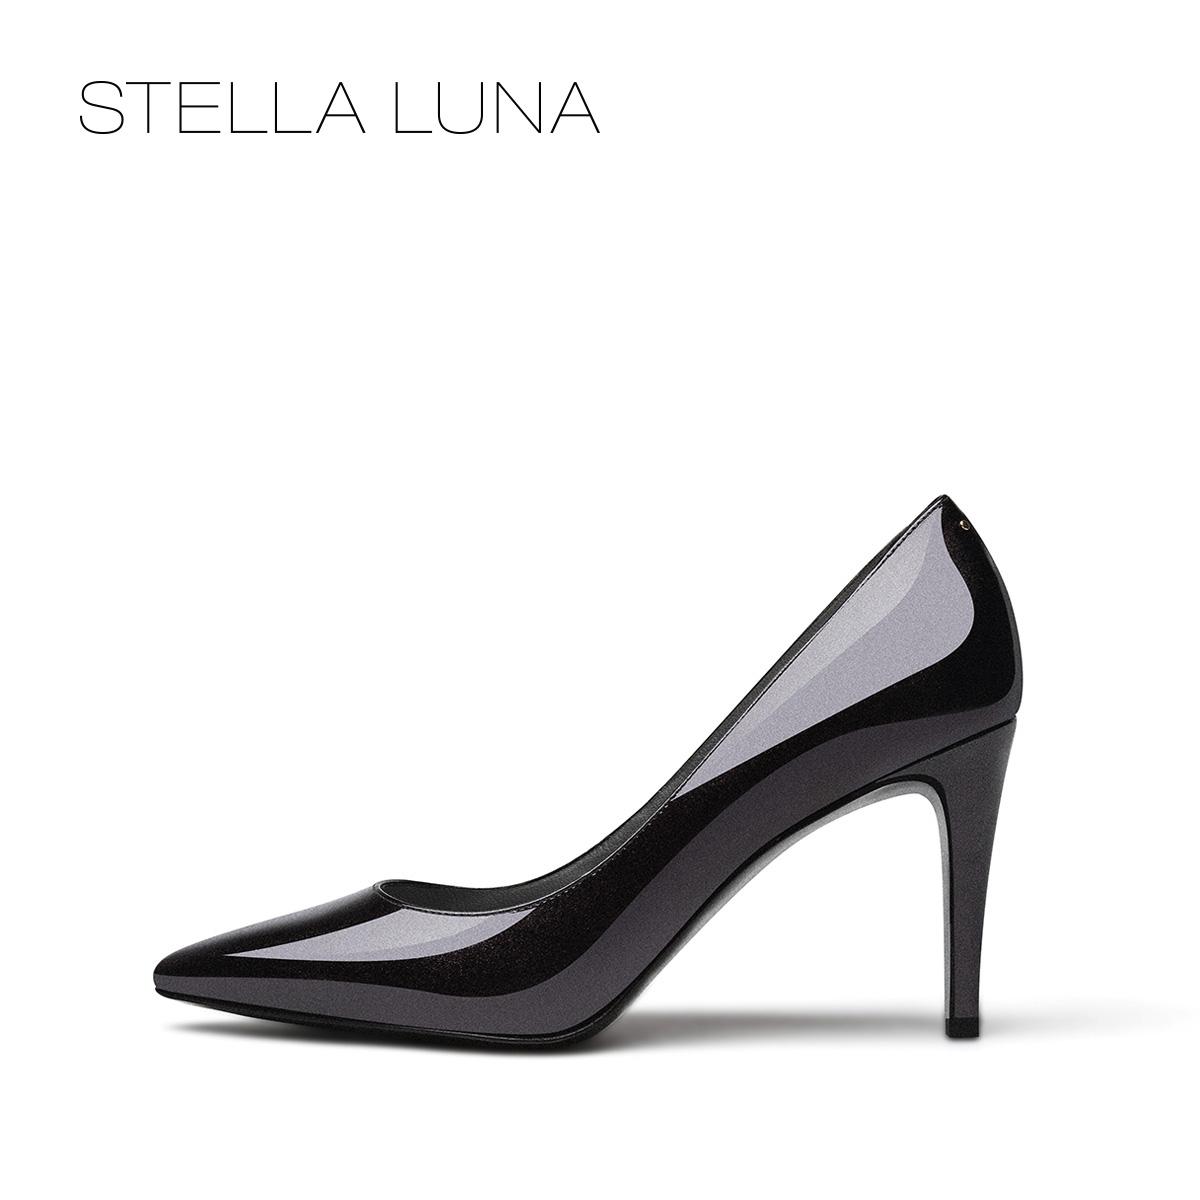 STELLA LUNA设计师款春夏尖头浅口通勤女鞋牛漆皮套脚高跟单鞋